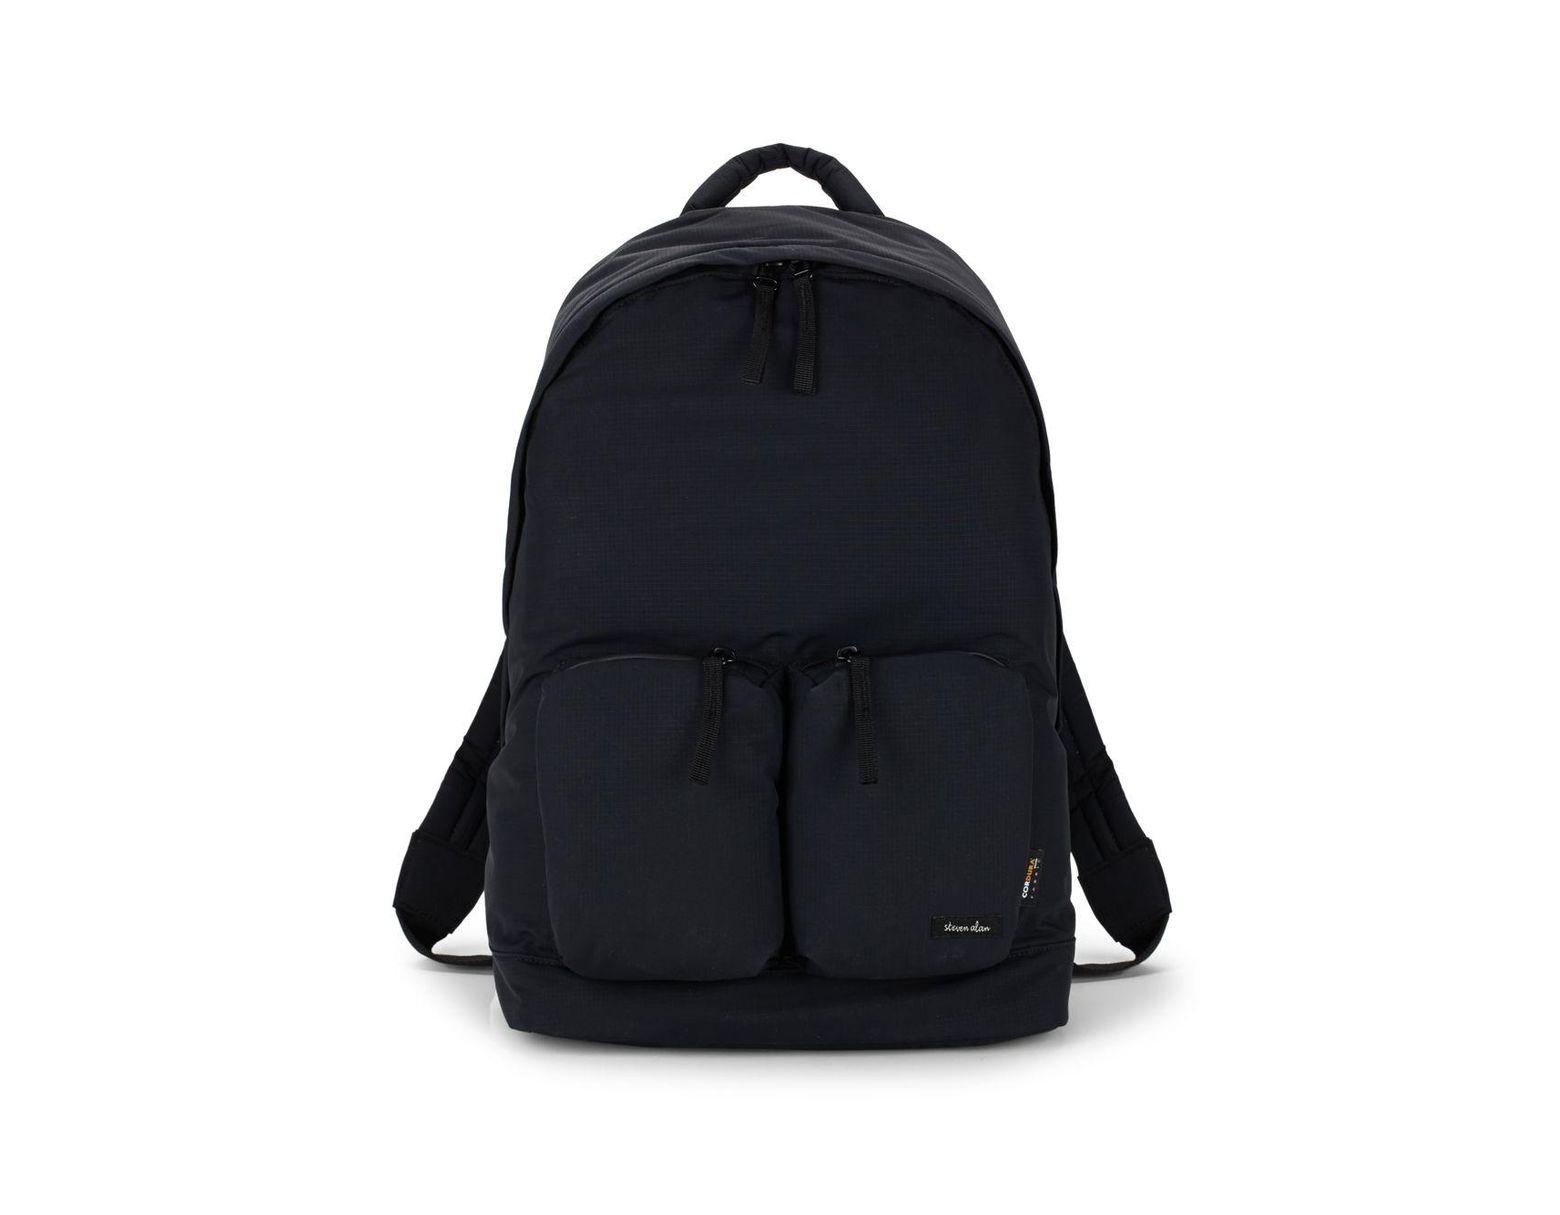 f671b9cd08c7d8 Steven Alan Zippered Backpack in Black for Men - Save 34% - Lyst